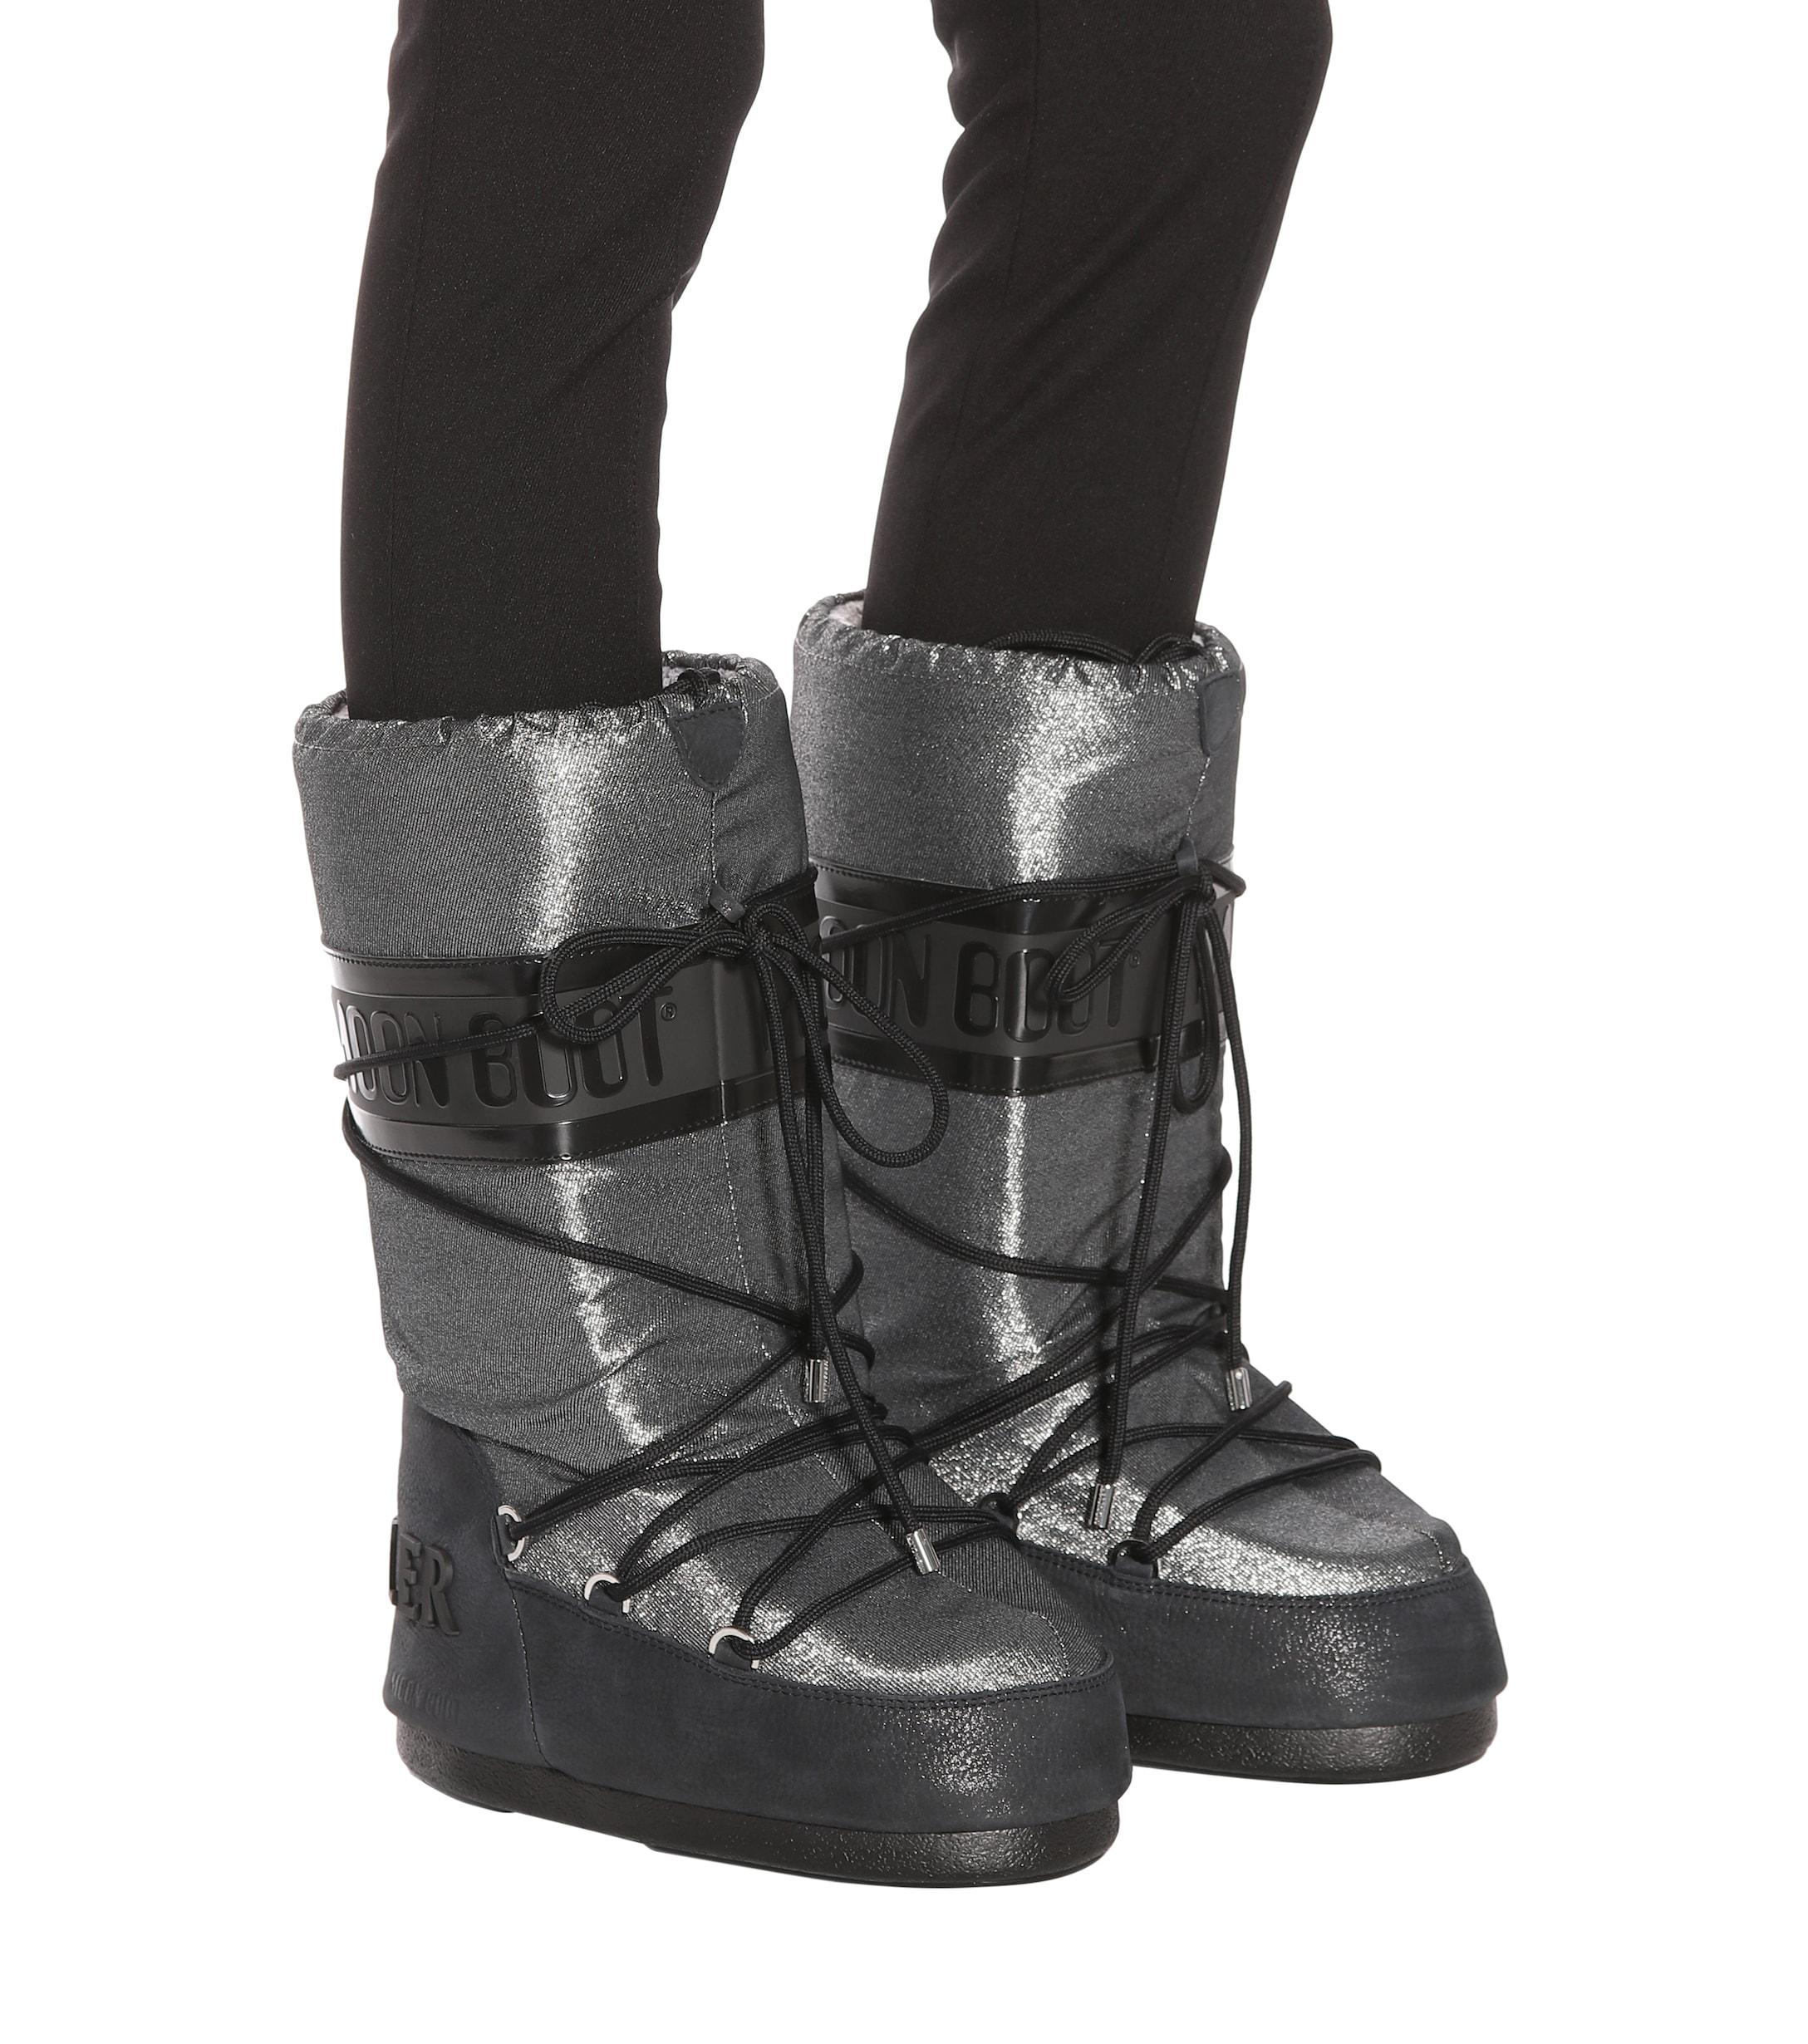 f2ff3bacfecb Lyst - Bottes après-ski x Moon Boot® Moncler en coloris Métallisé